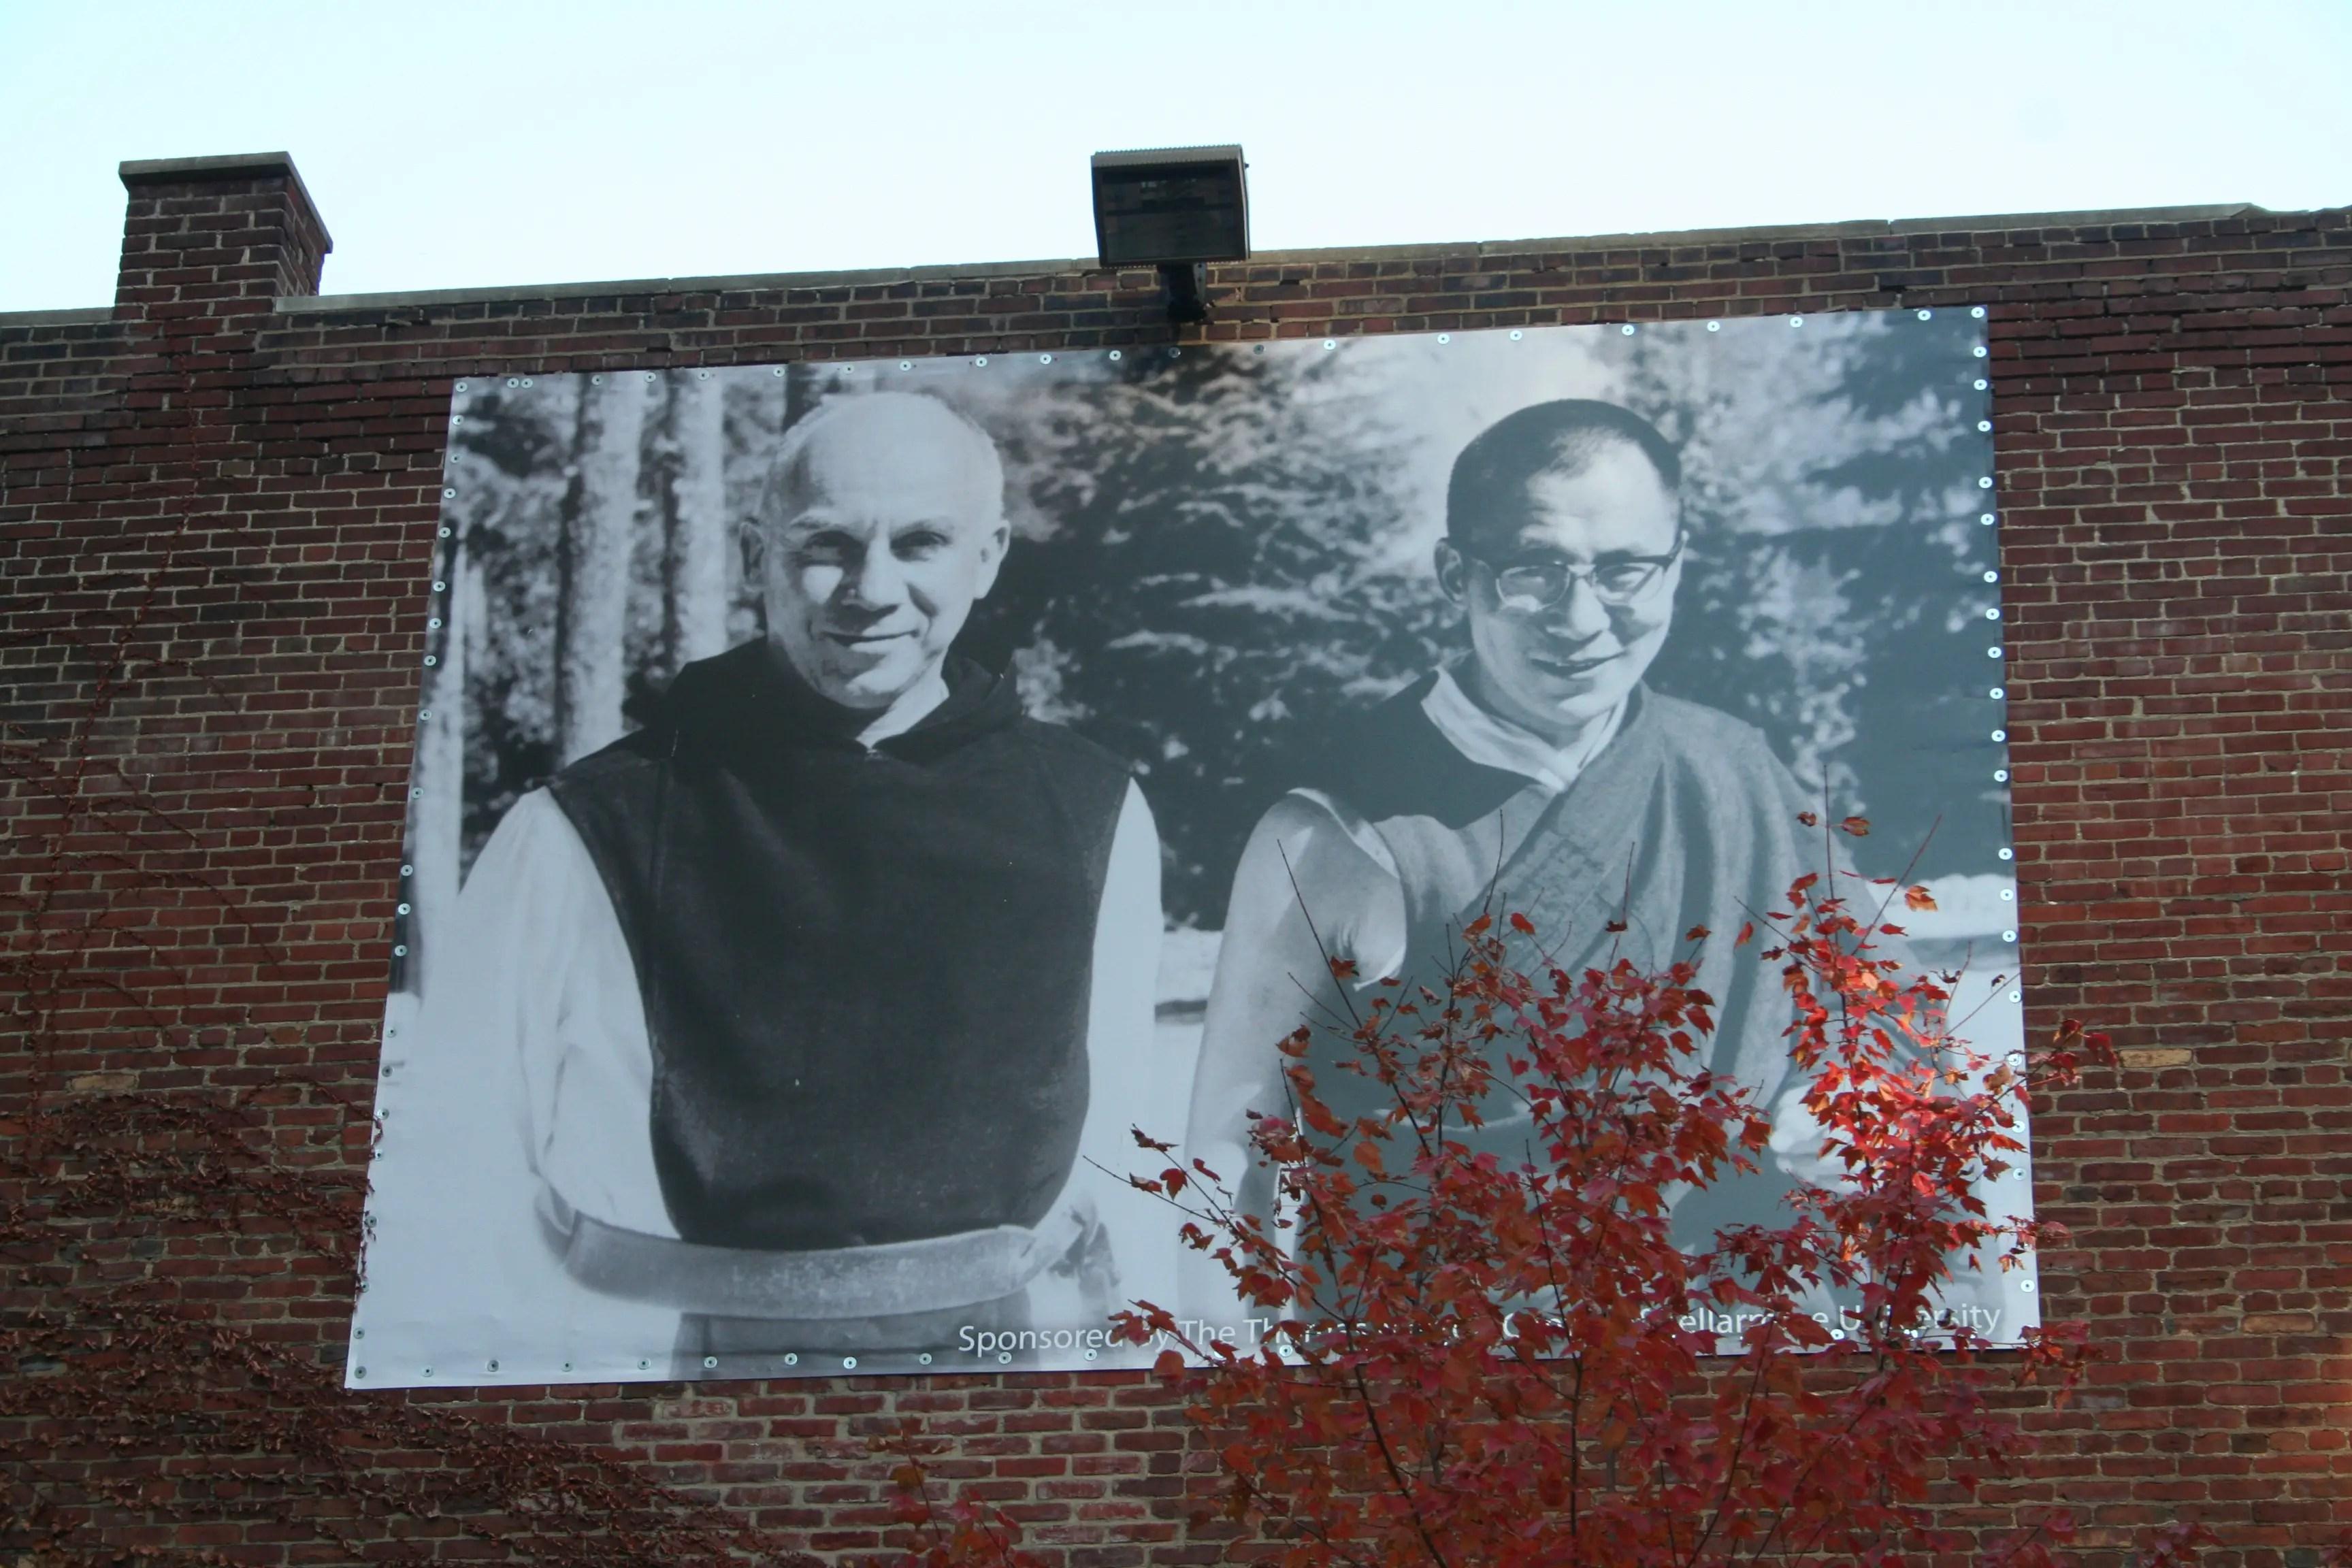 ... Louisville of Thomas Merton and the Dalai Lama (Lori Erickson photo